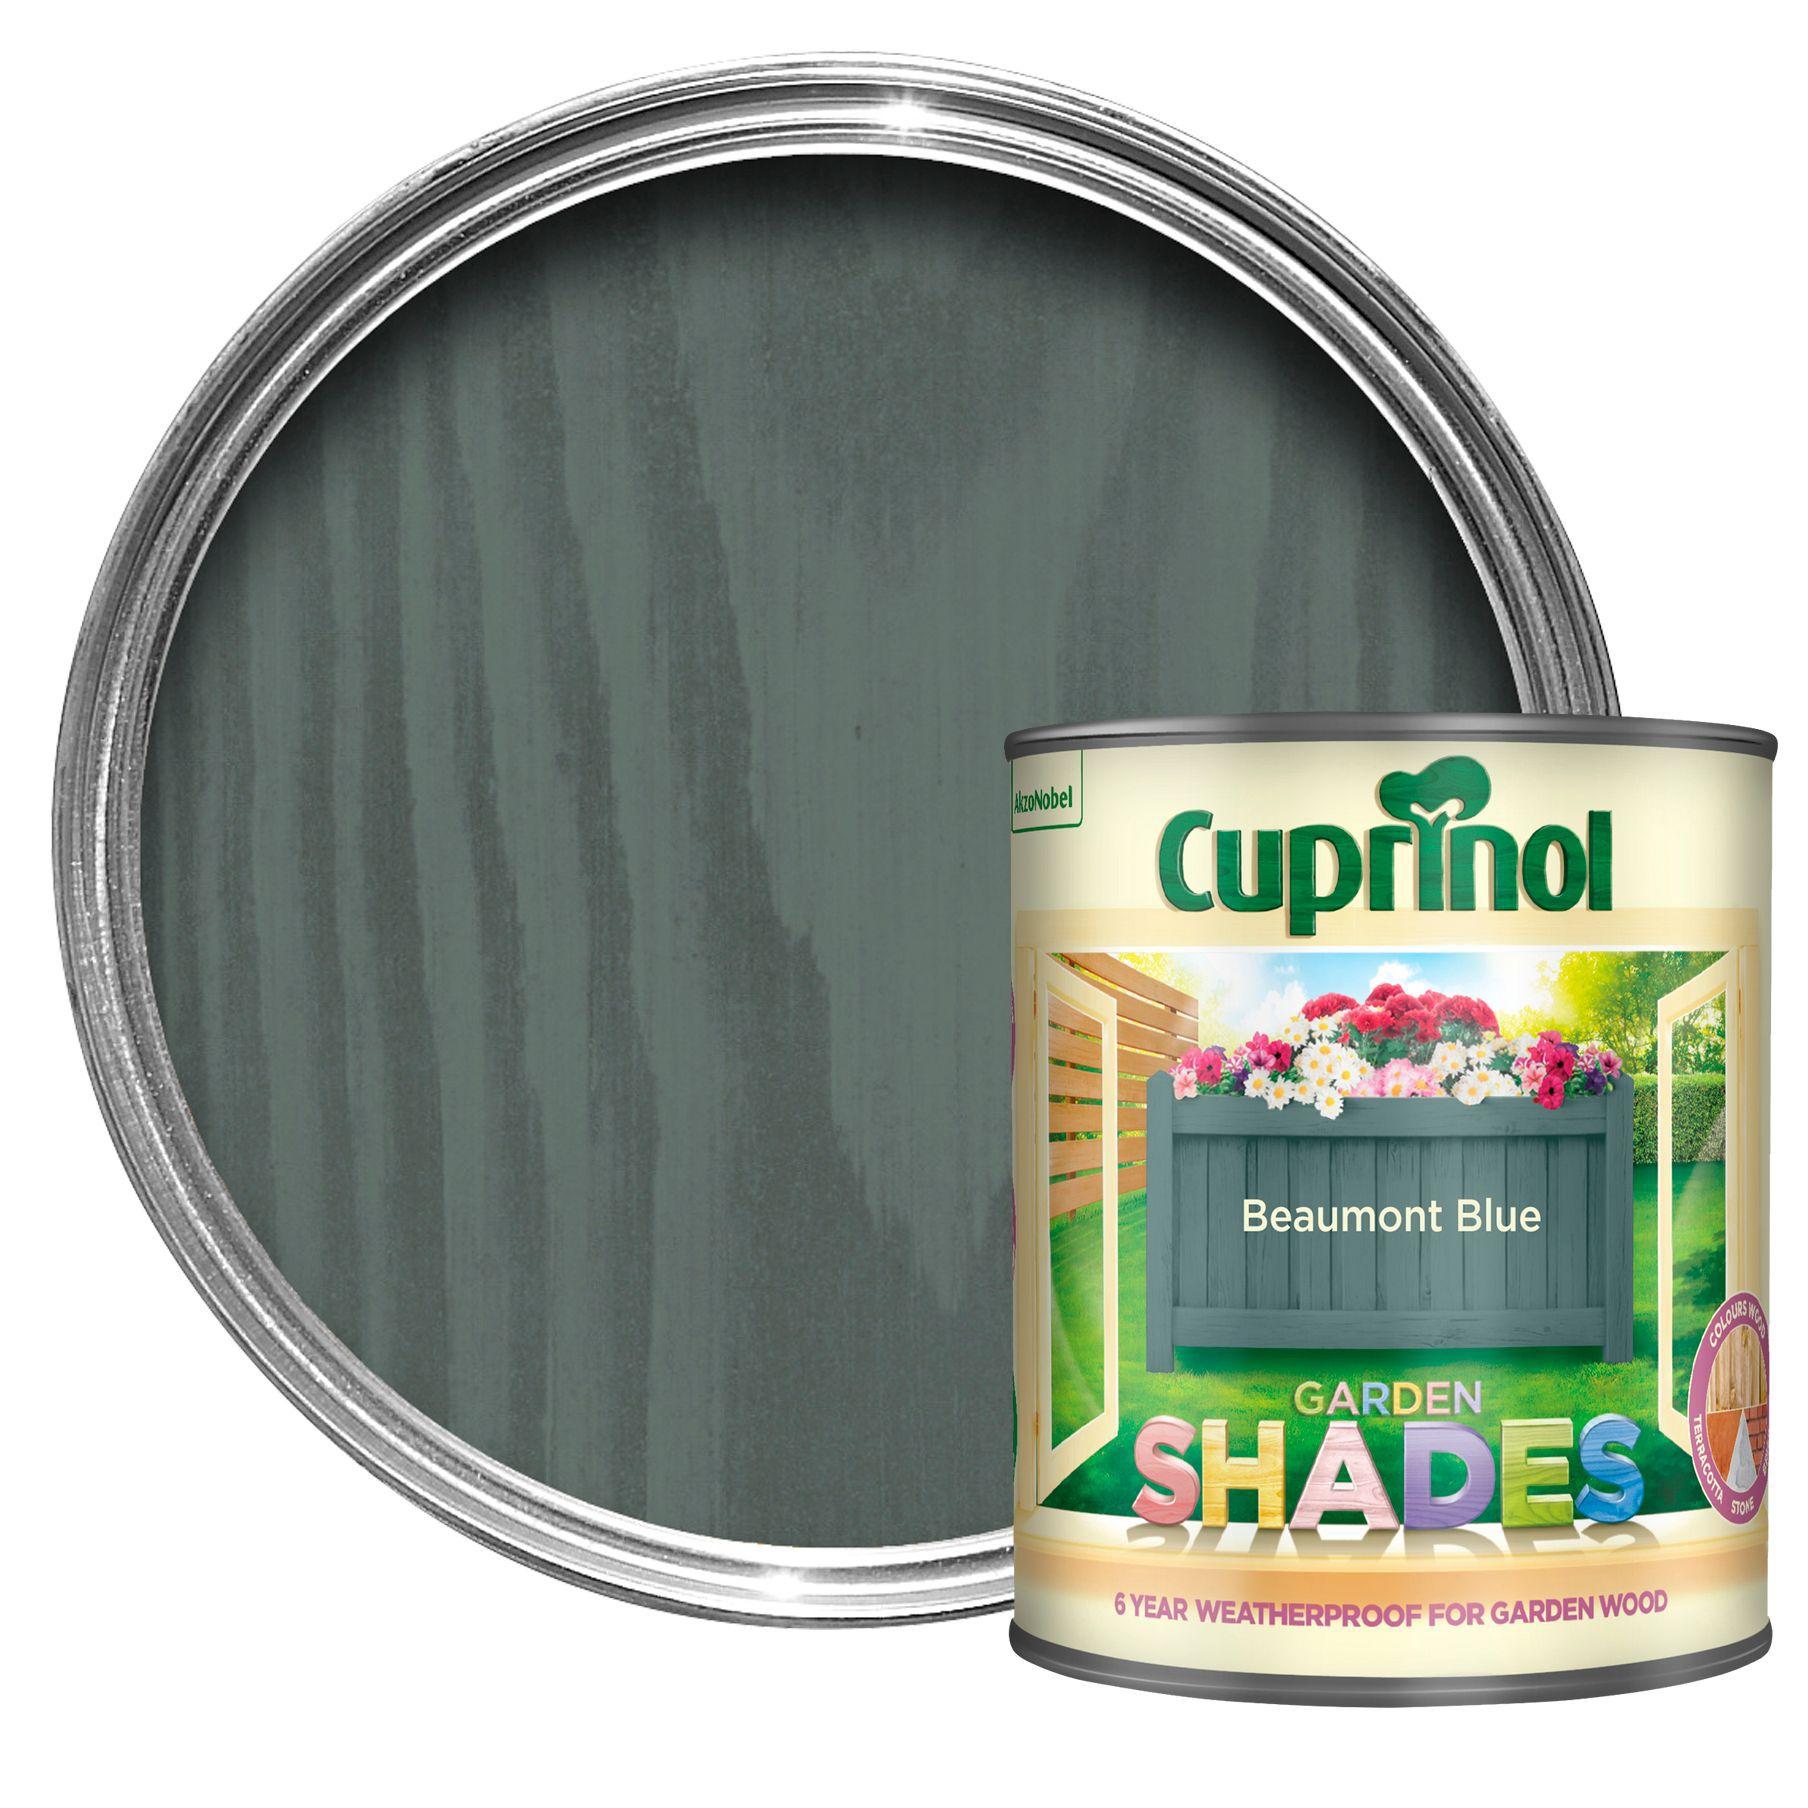 Cuprinol Garden Shades Beaumont Blue Matt Wood Paint 1l Departments Diy At B Q